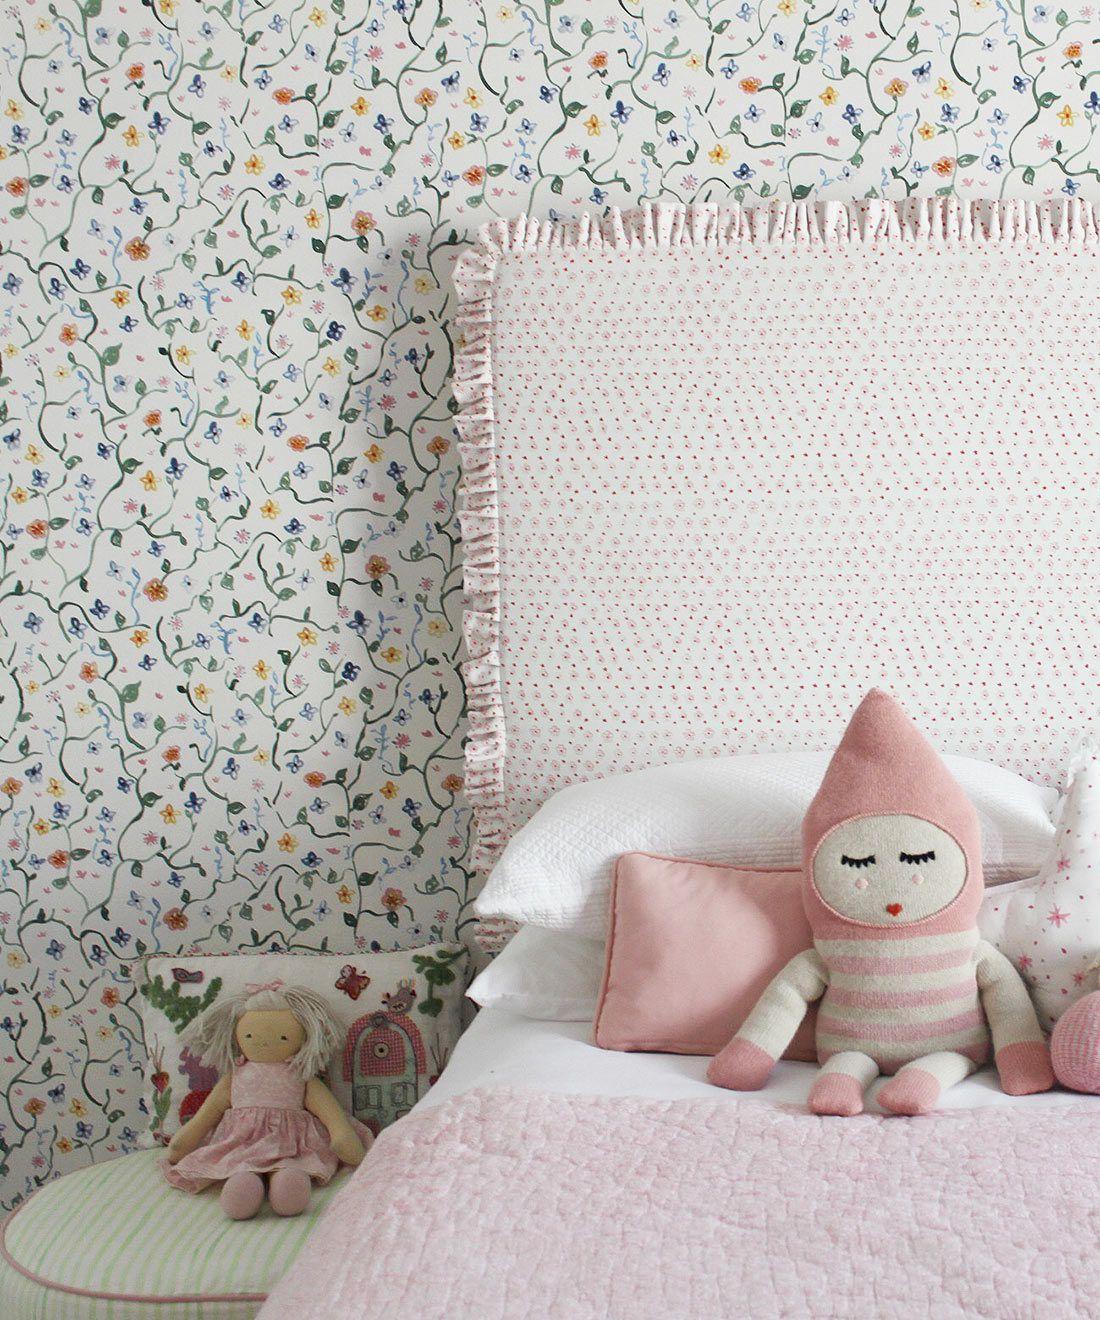 Wild Garden • Dainty Floral Wallpaper • Milton & King Europe •Georgia MacMillan • Childrens Wallpaper • Nursery Wallpaper • Bed with pink headboard and pink duvet